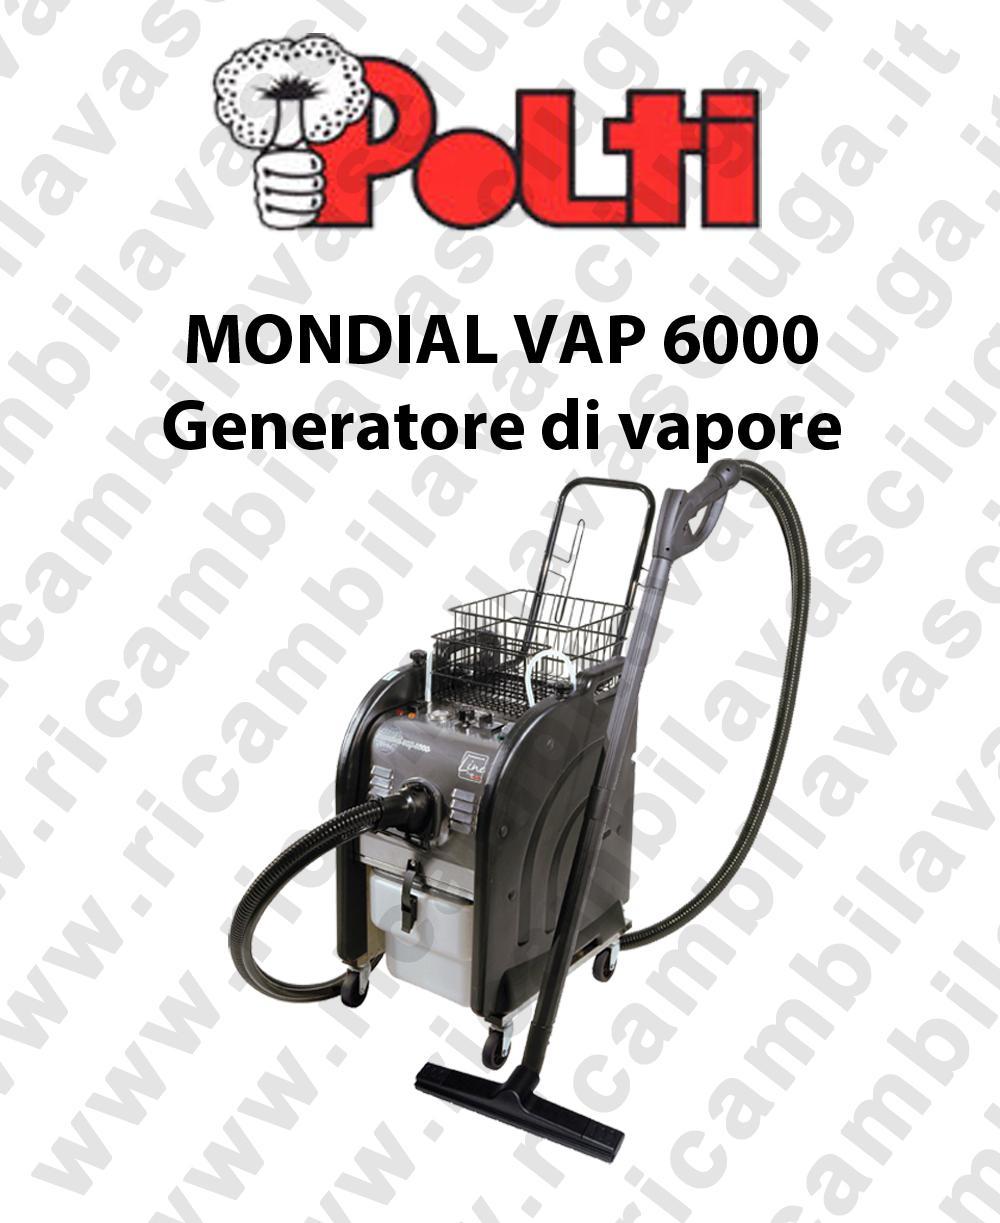 POLTI MONDIAL VAP 6000 generatore di vapore professionale